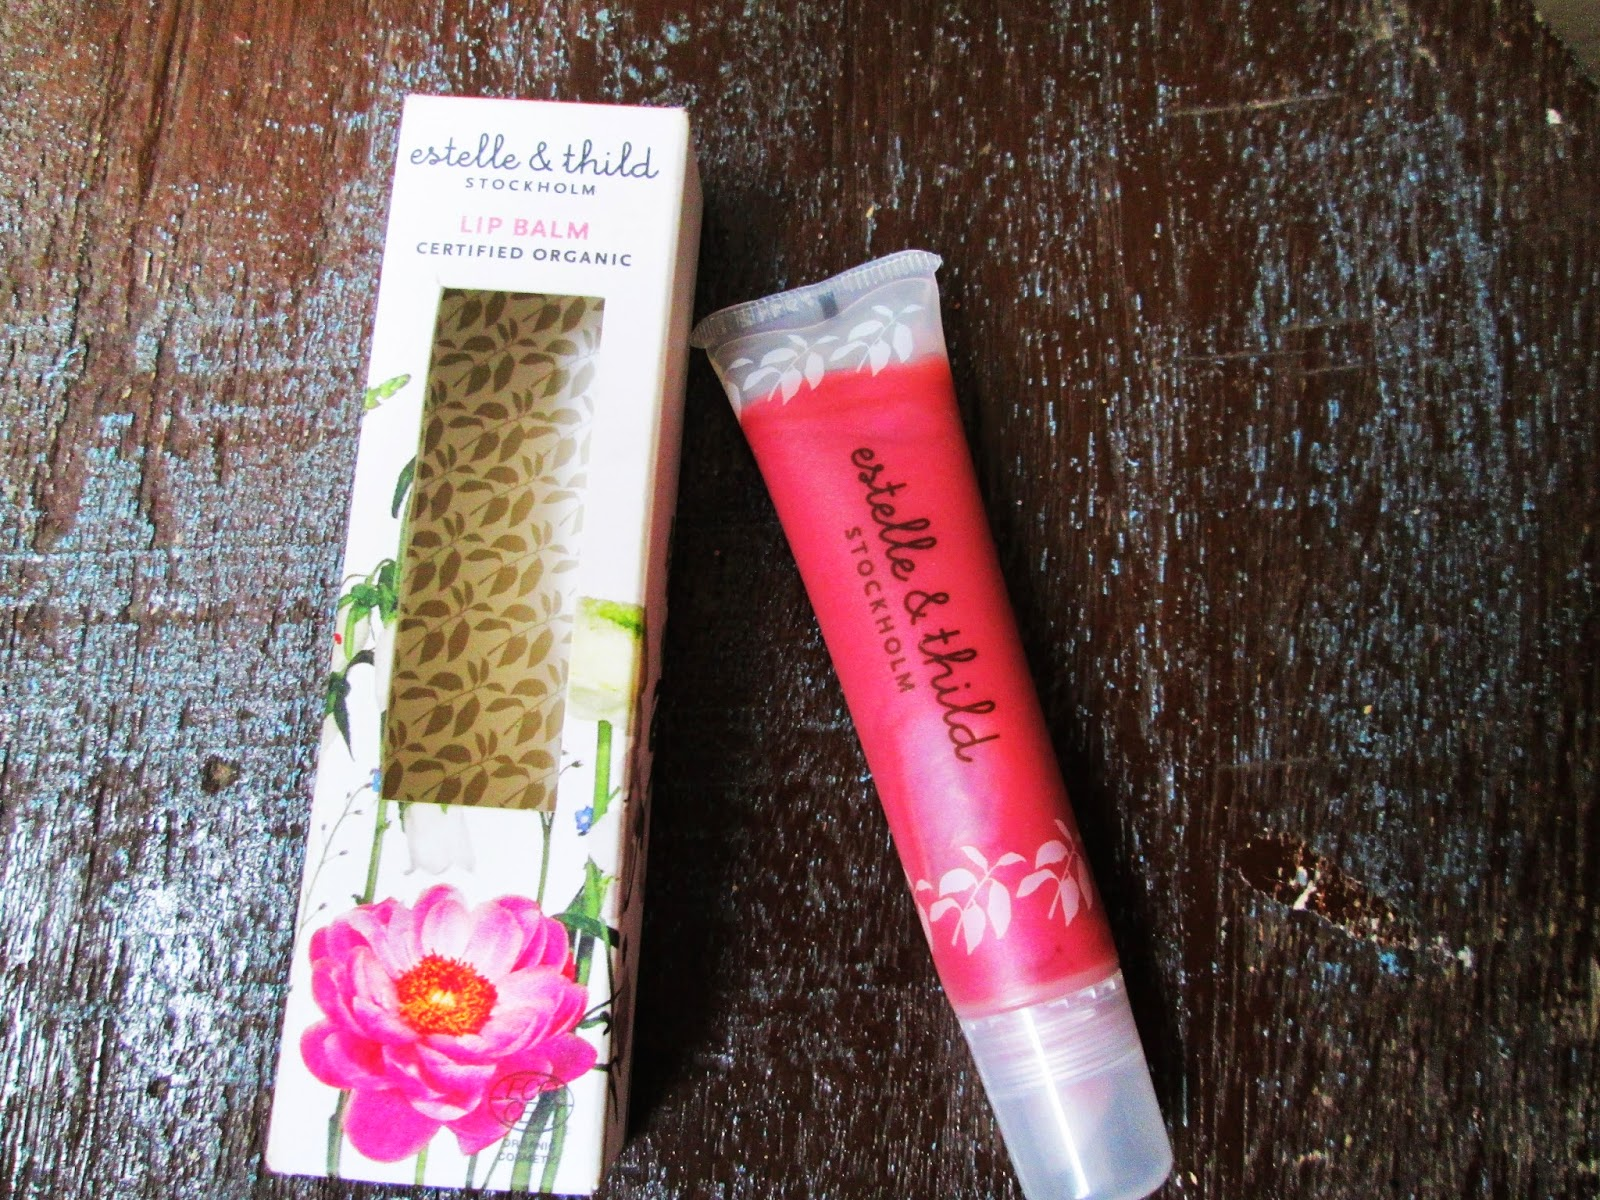 estelle & thild raspberry lip balm